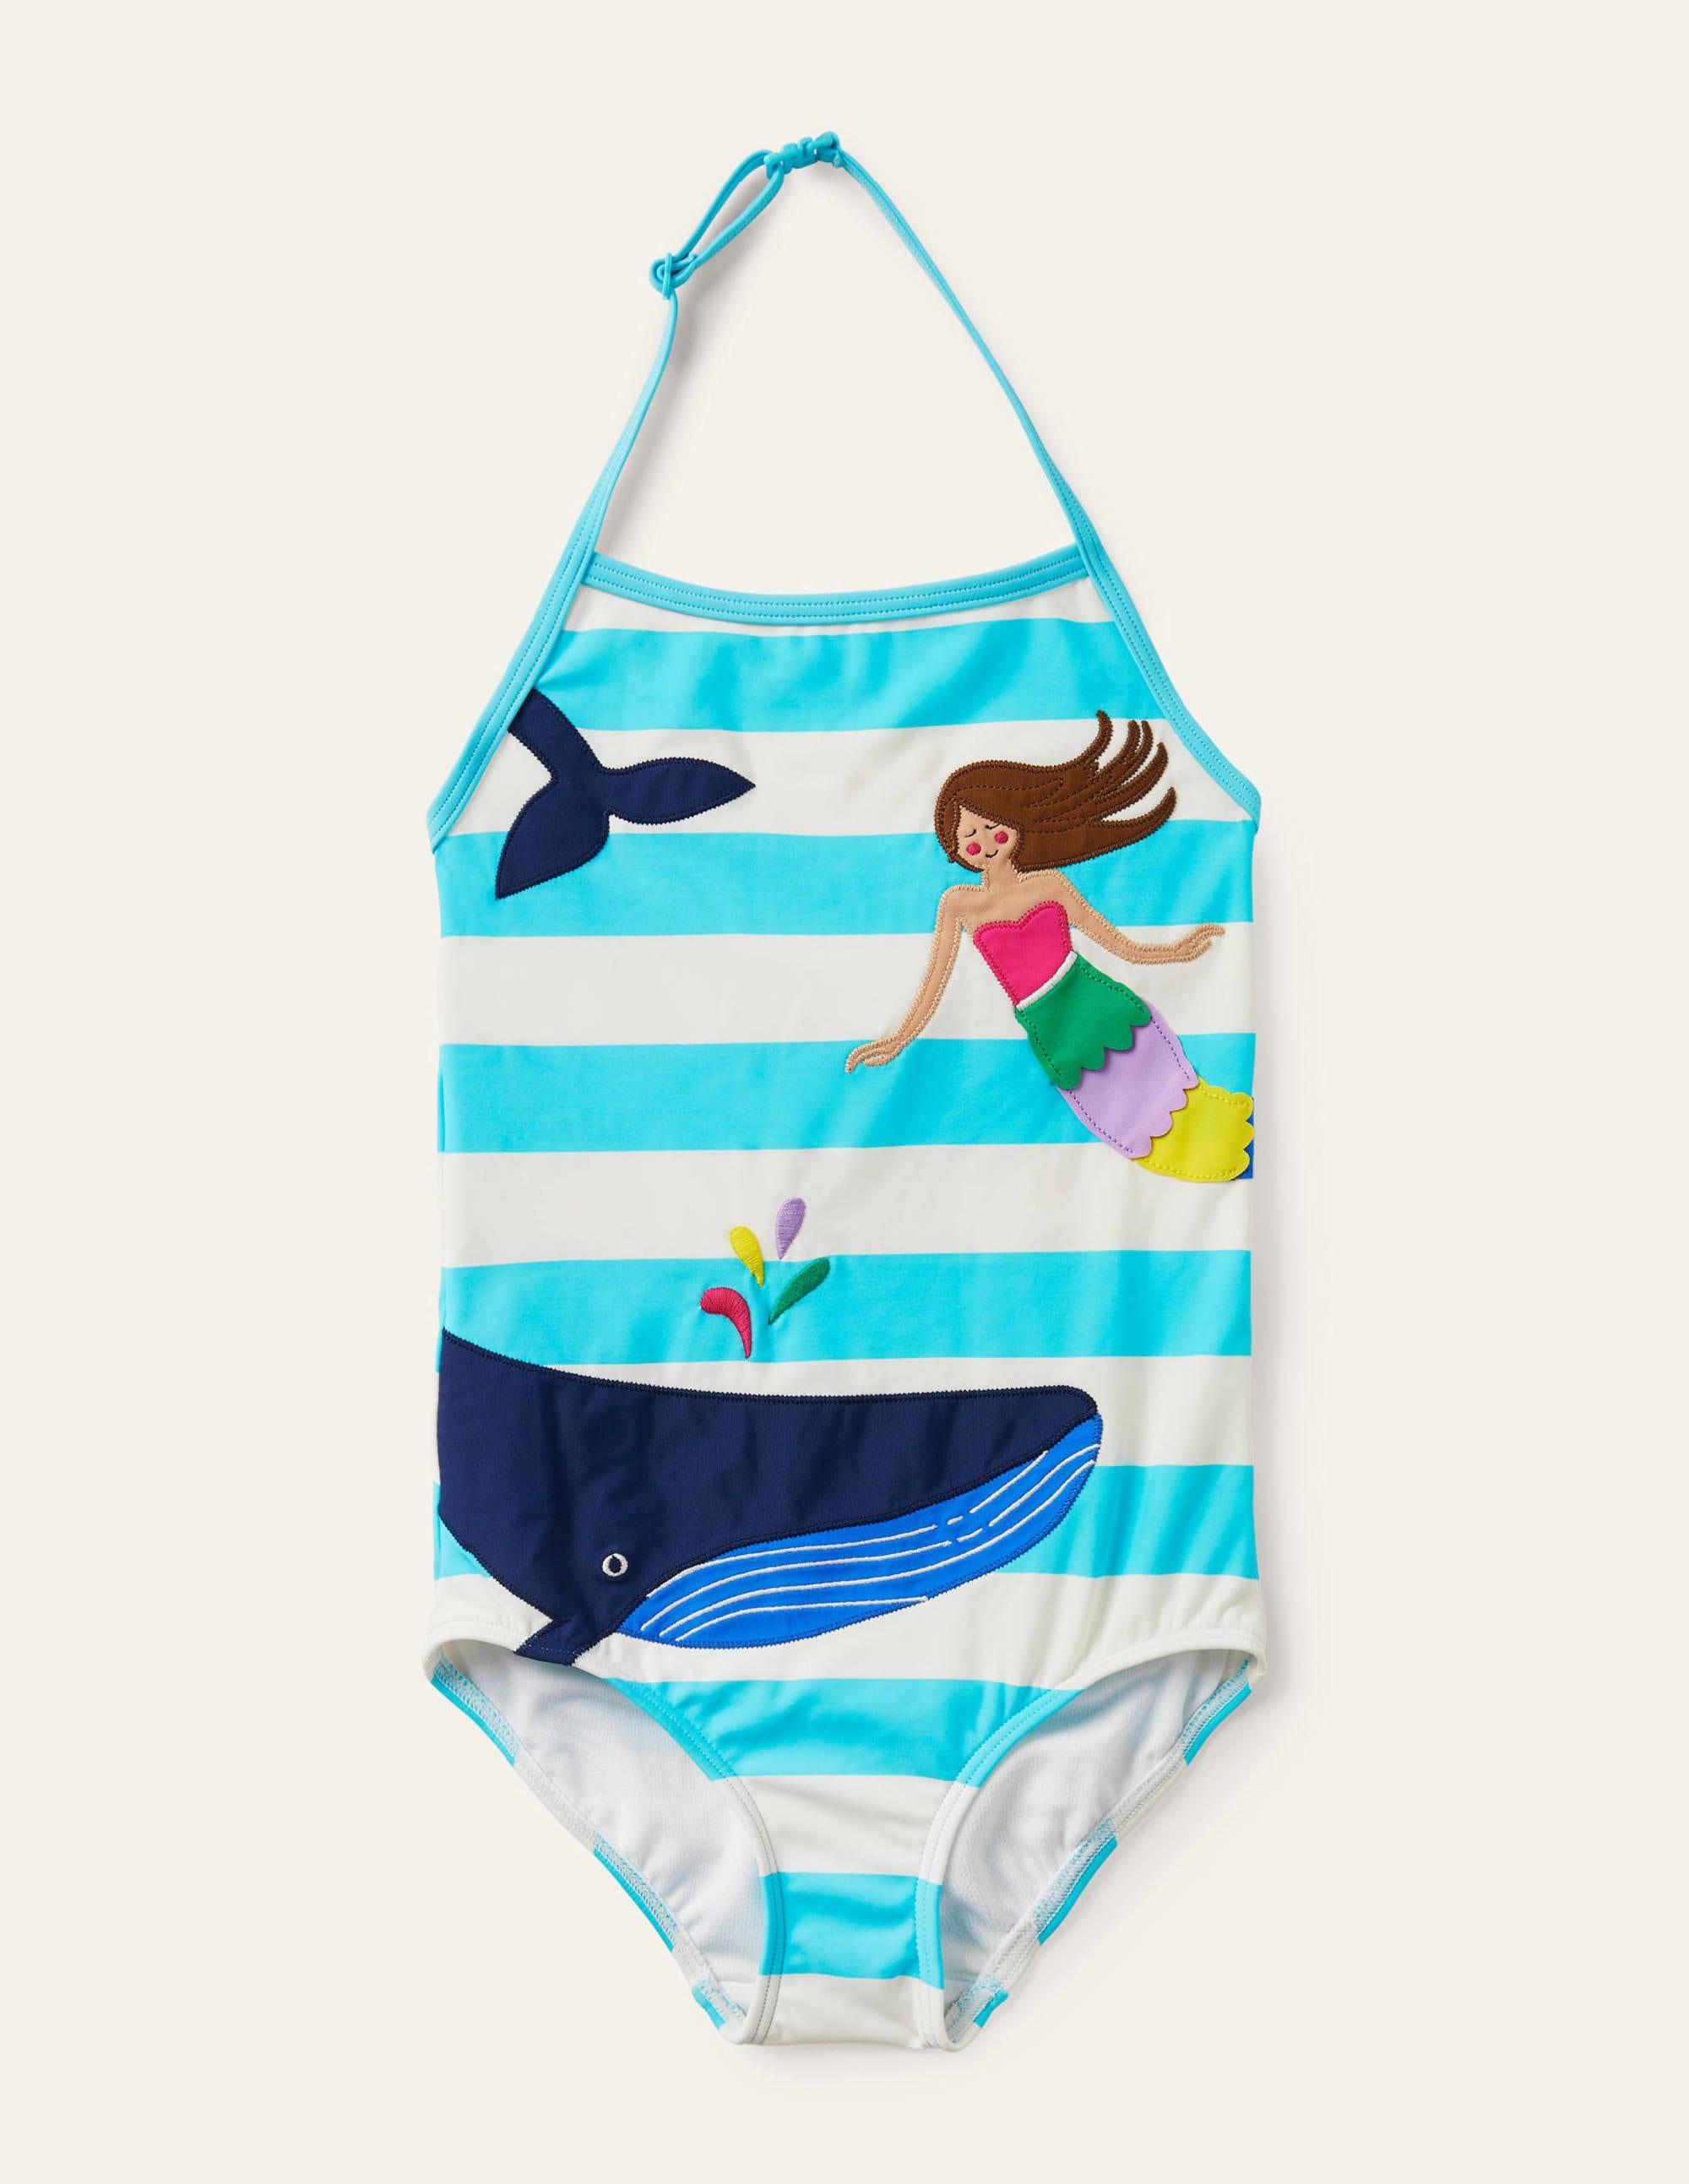 Boden Applique Swimsuit - Light Blue/ Ivory Mermaid